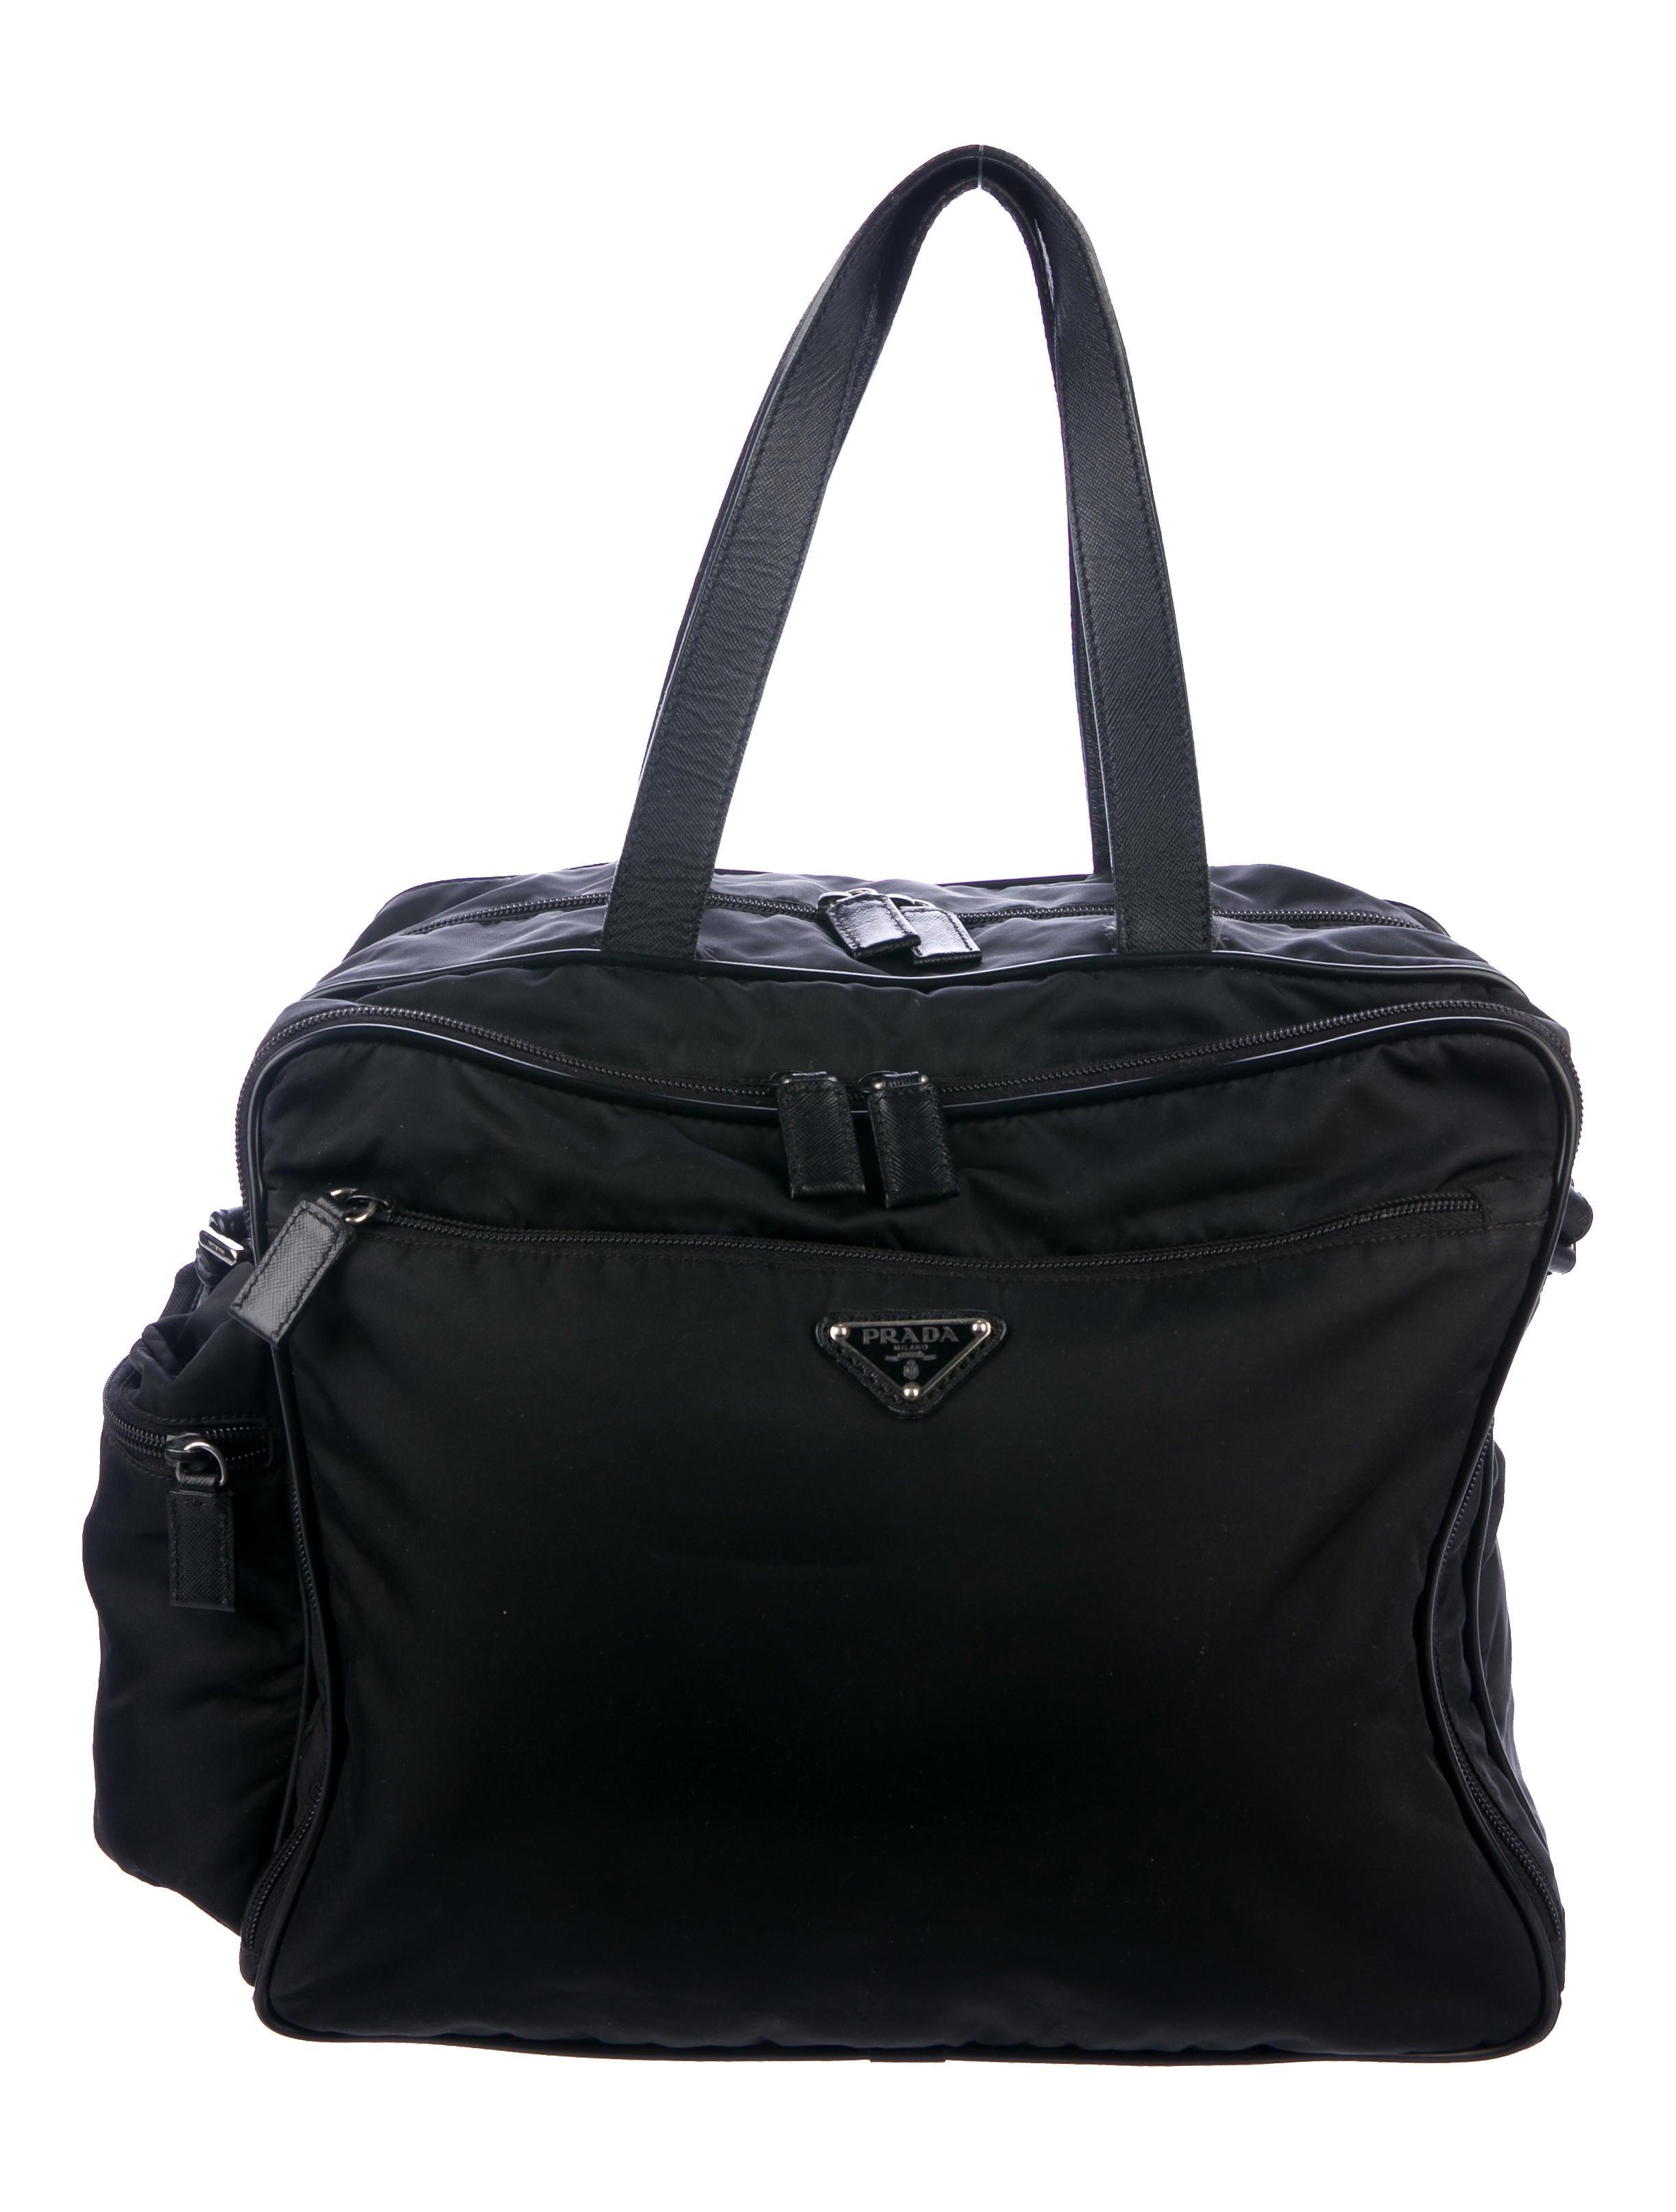 36778039681c Prada Handbags